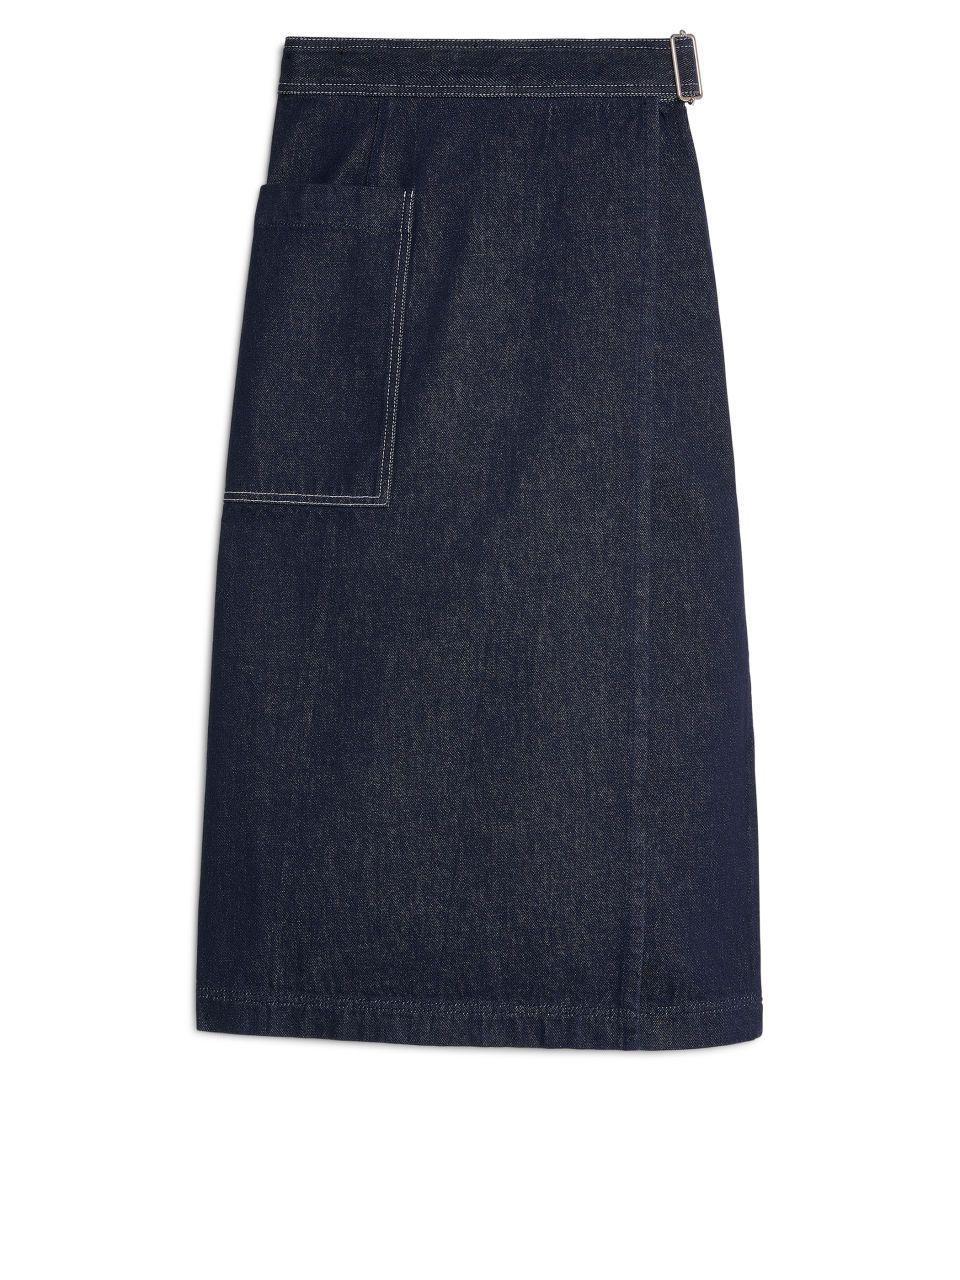 Denim Wrap Skirt Dark Blue Skirts | Denim wrap skirt